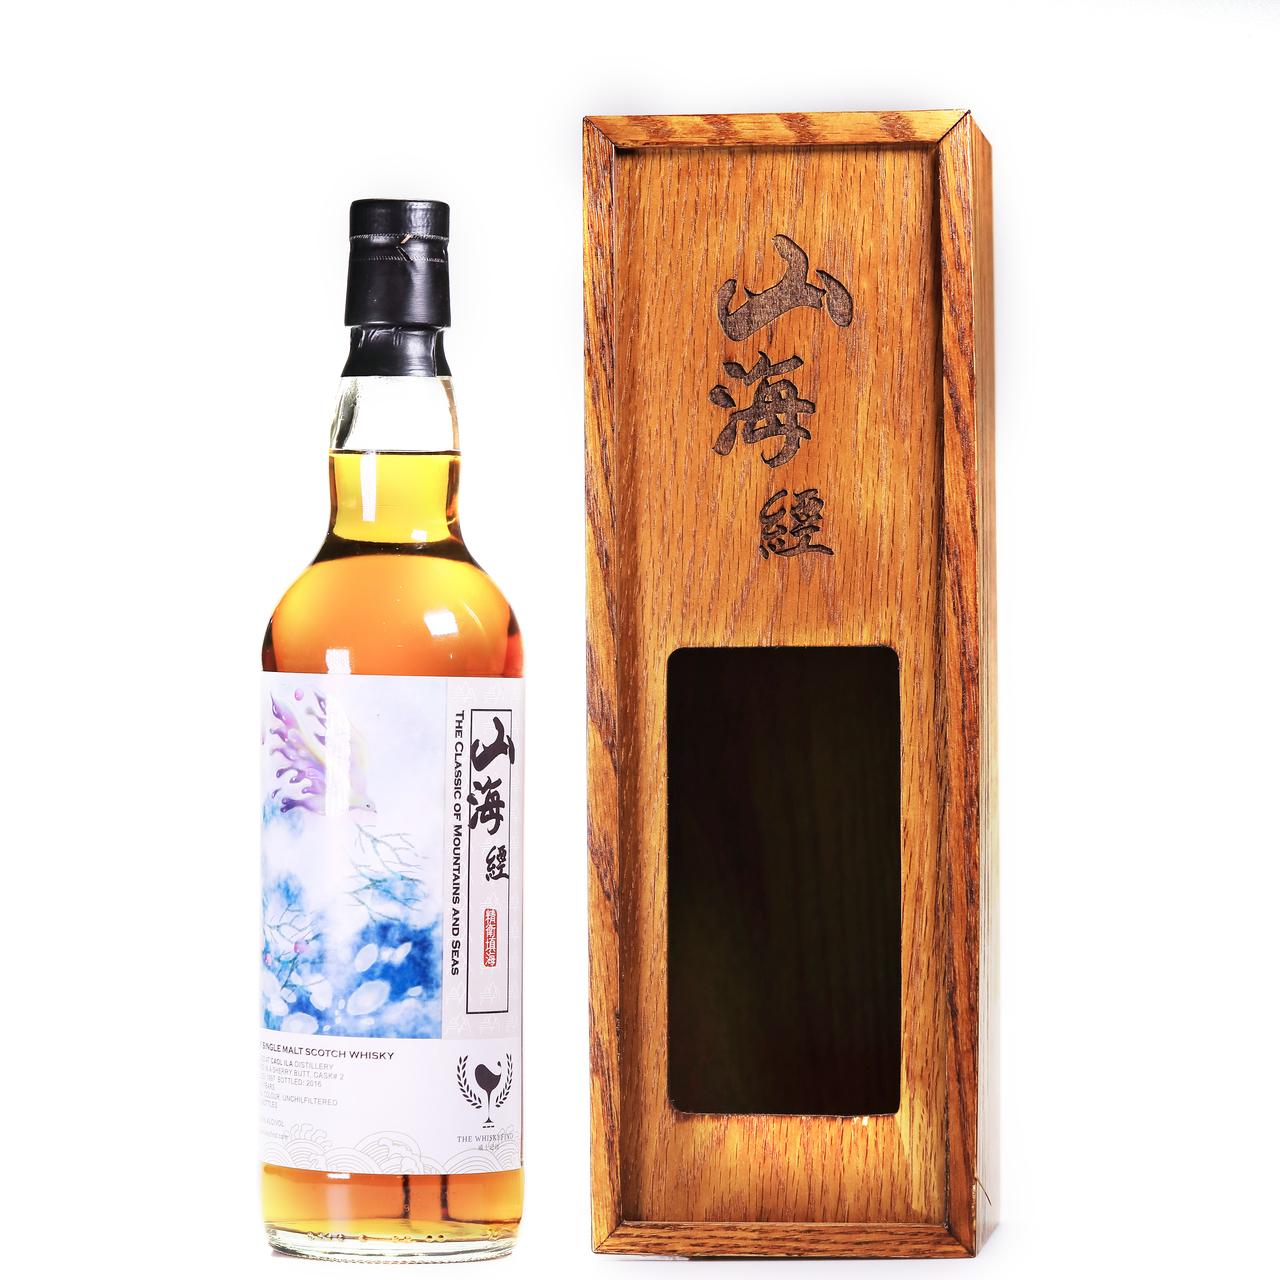 Caol ila 1997  the whisky find 18 year old  2 %e5%b1%b1%e6%b5%b7%e7%b6%93